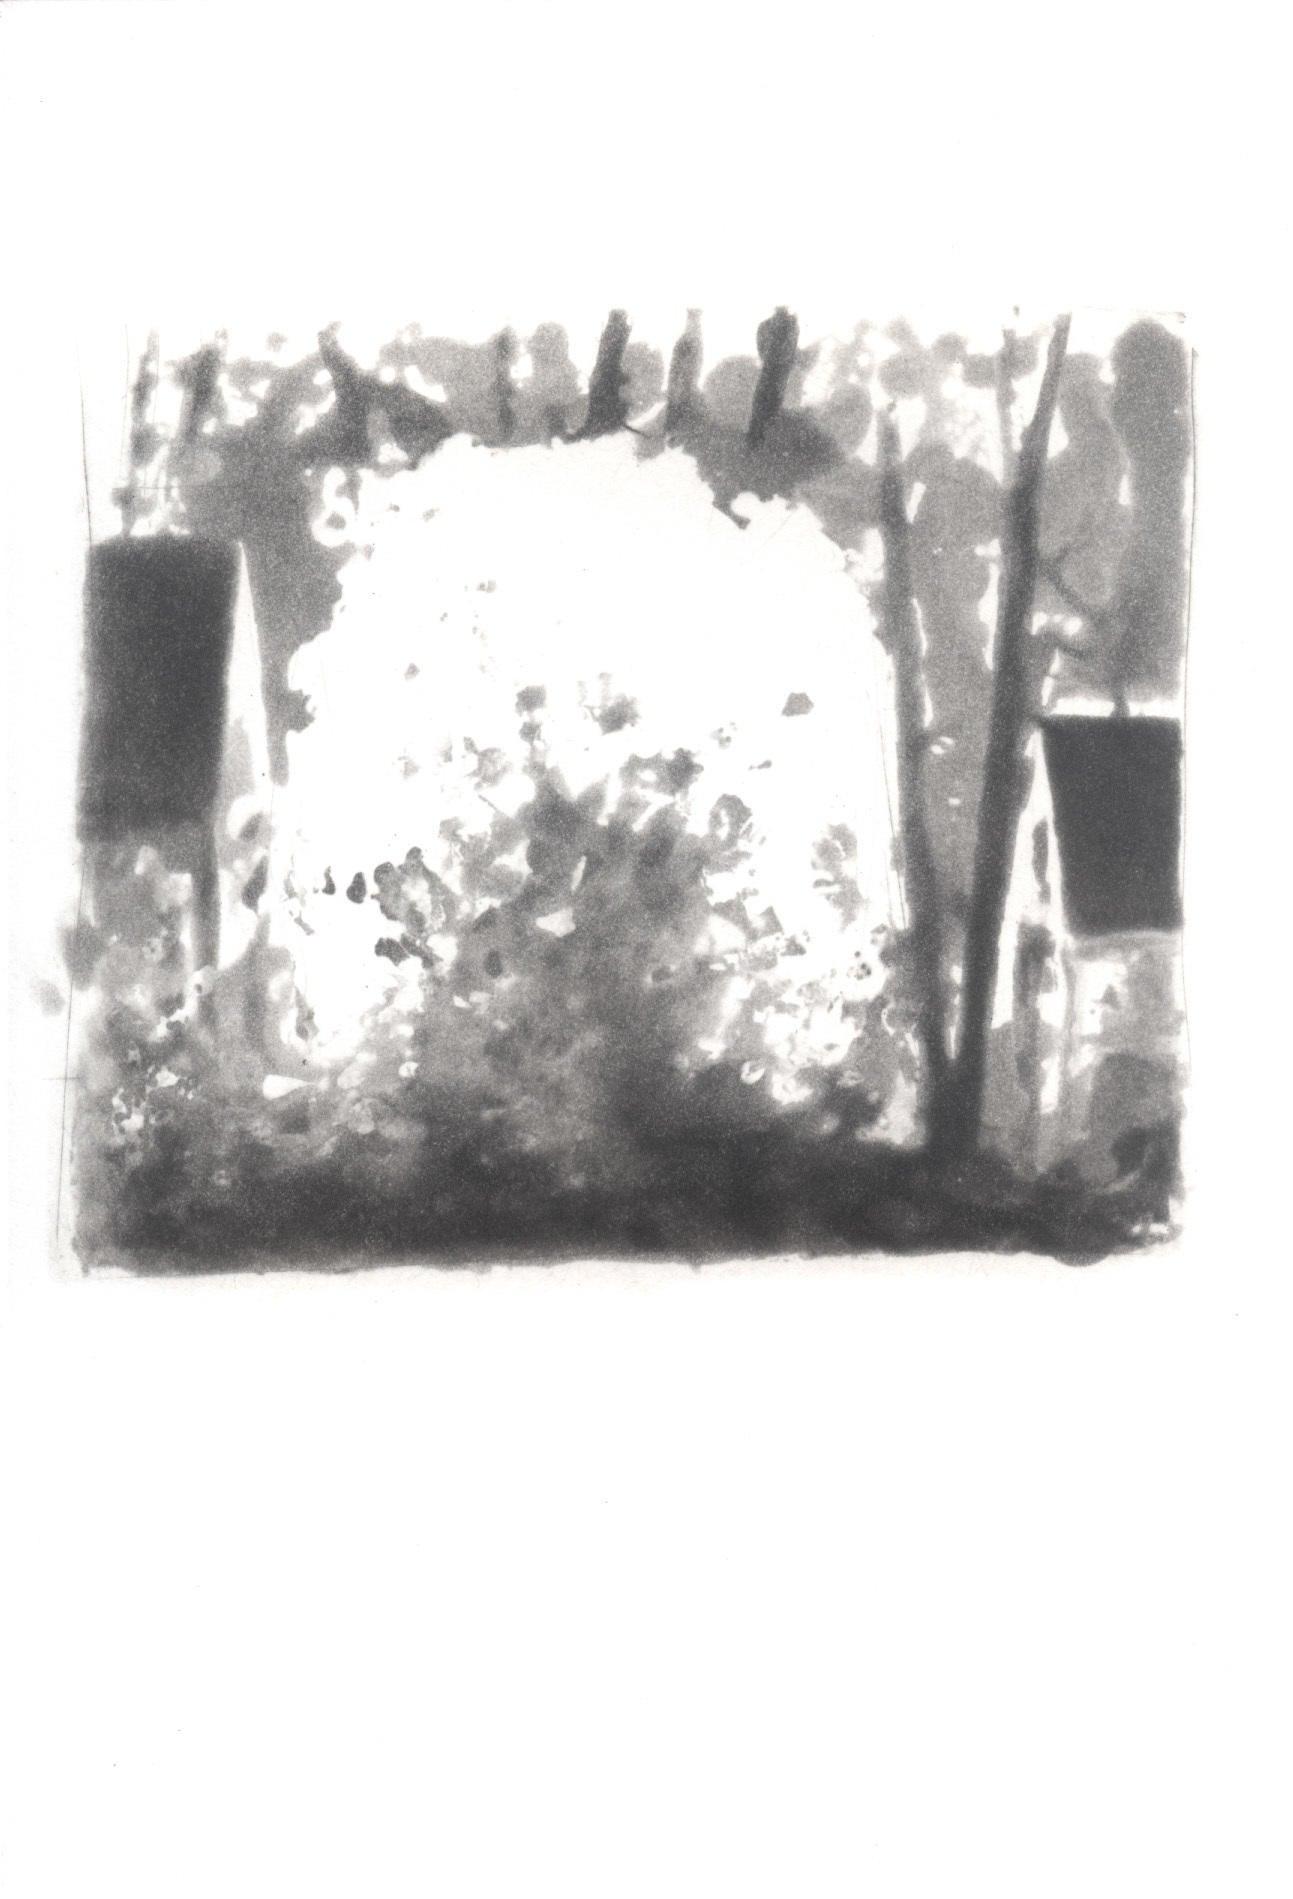 III. Star Magnolia image